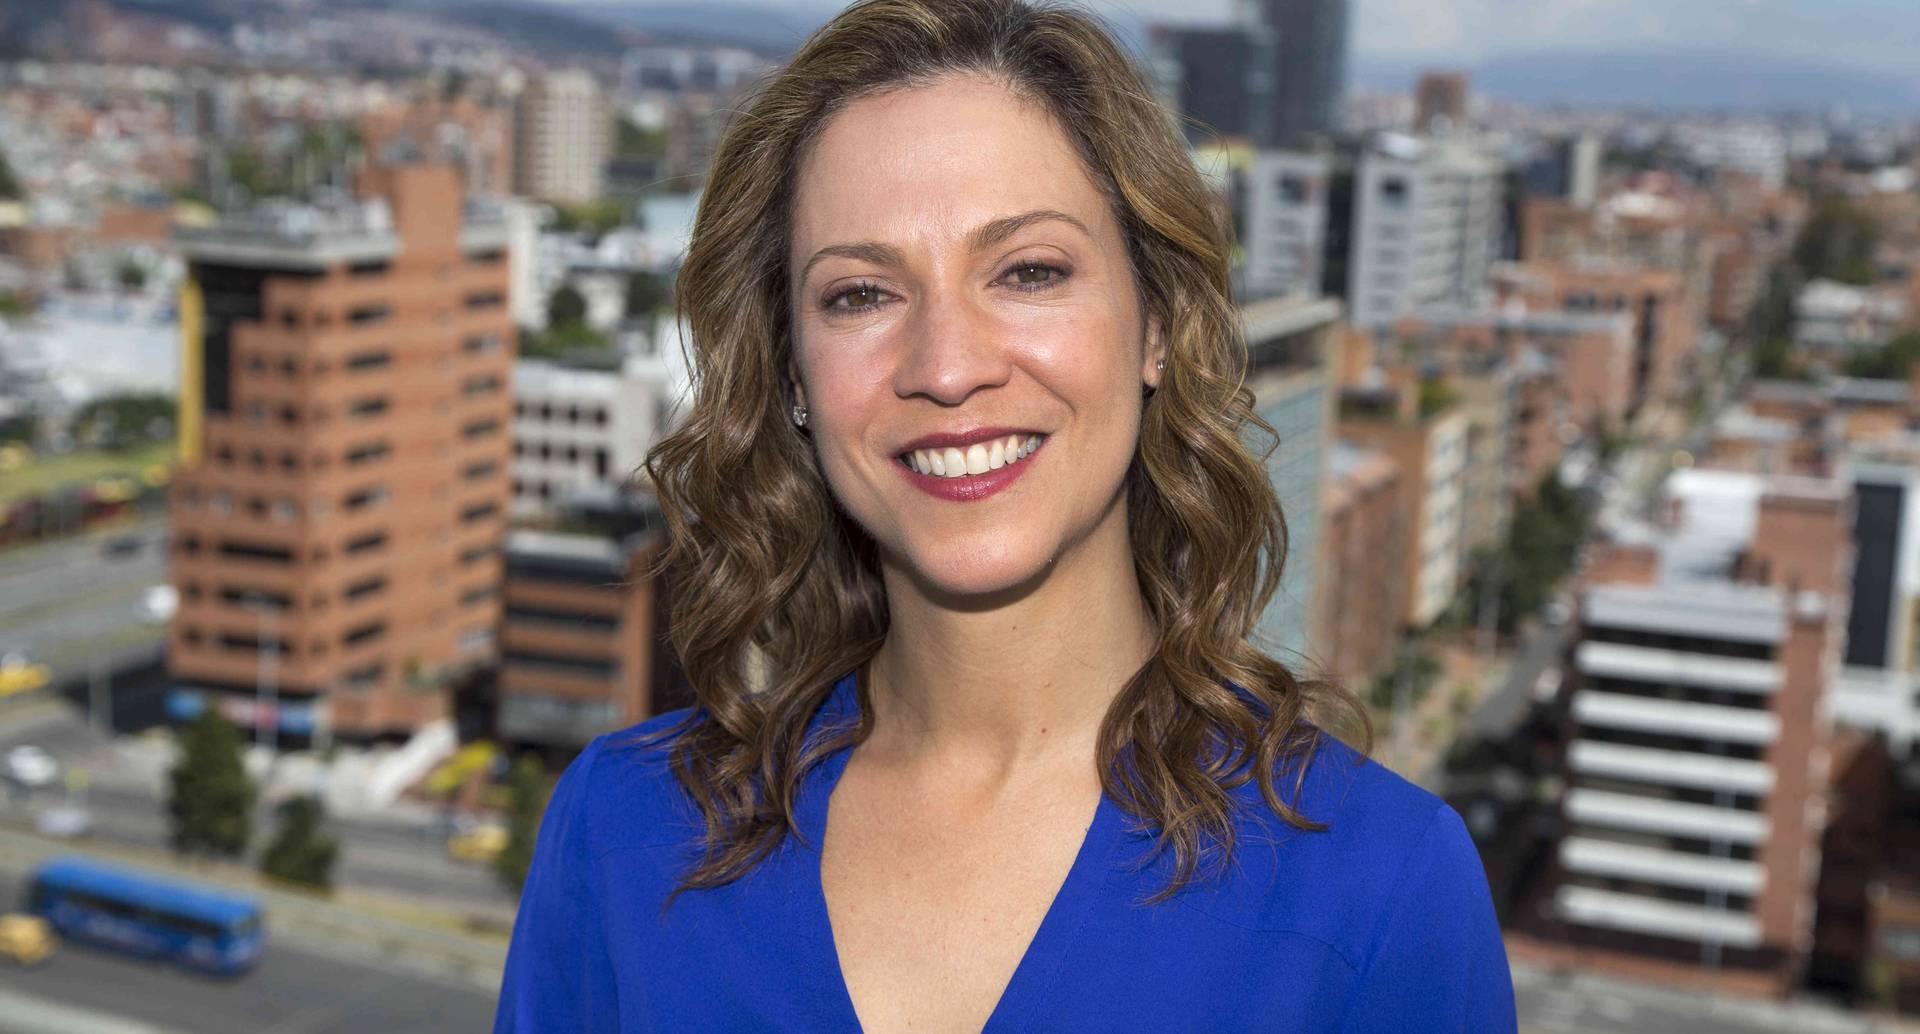 María Claudia Lacouture, director de AmCham, cámara de comercio colombo americana.